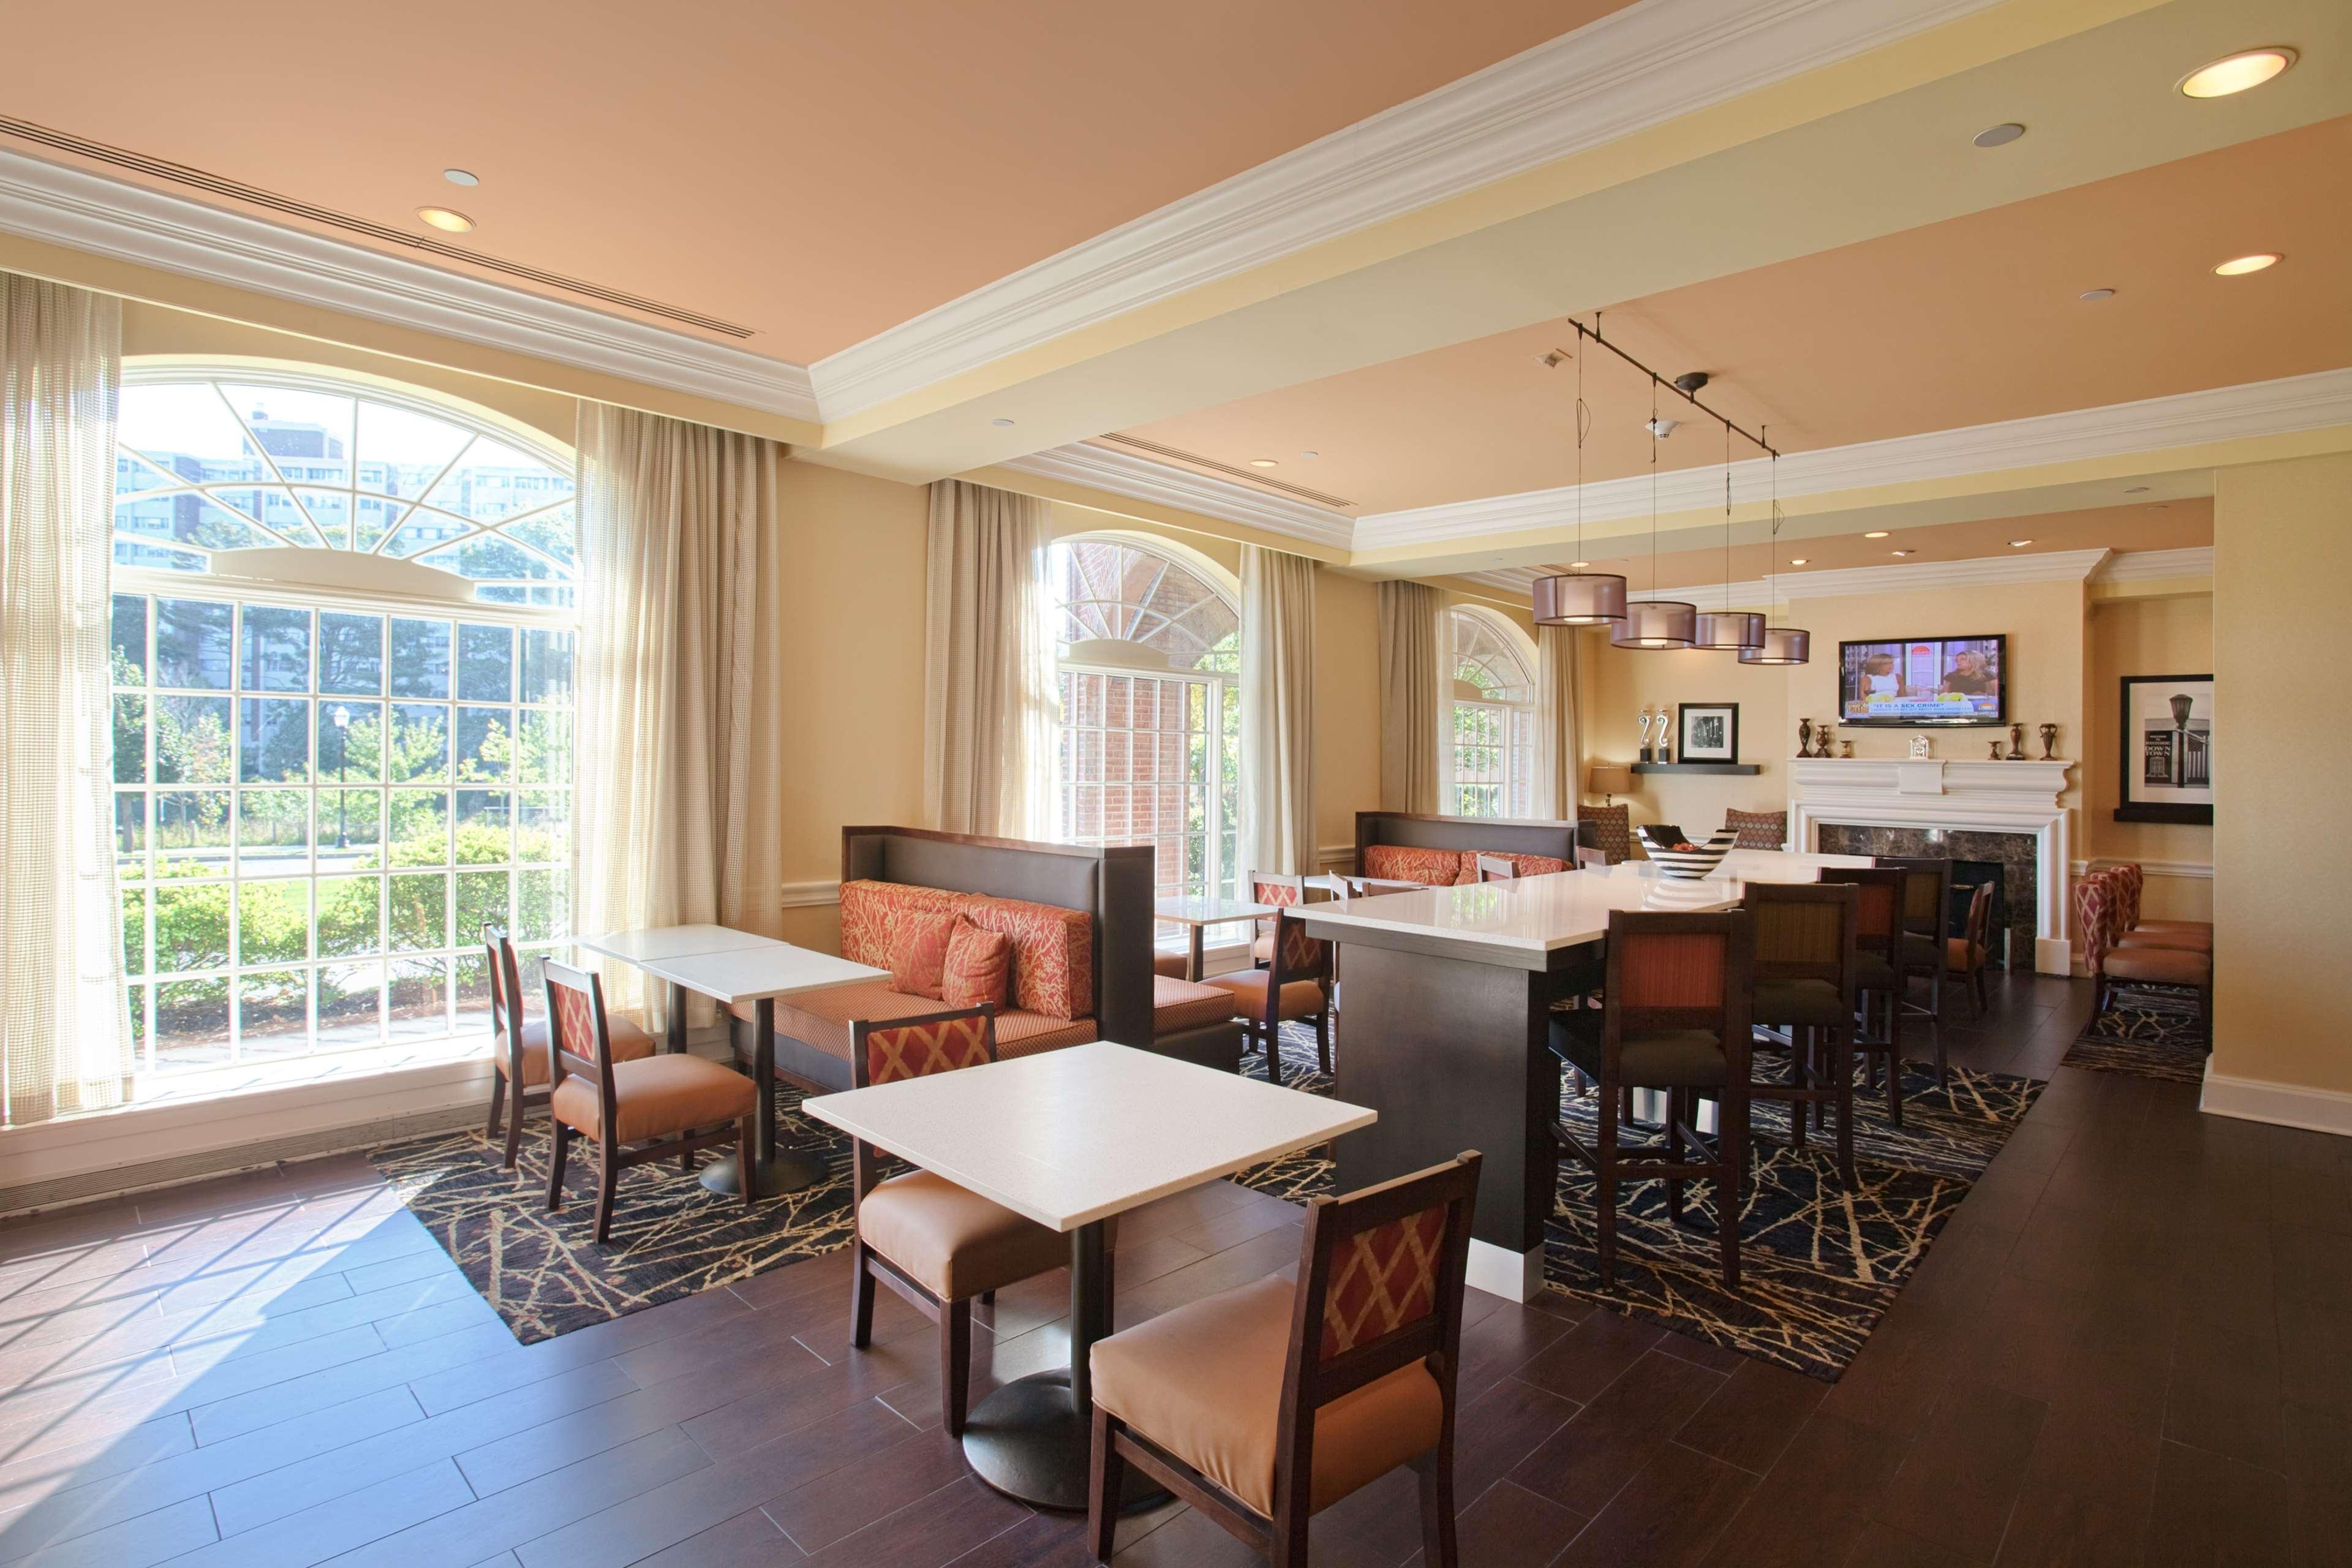 Hampton Inn & Suites Stamford image 14